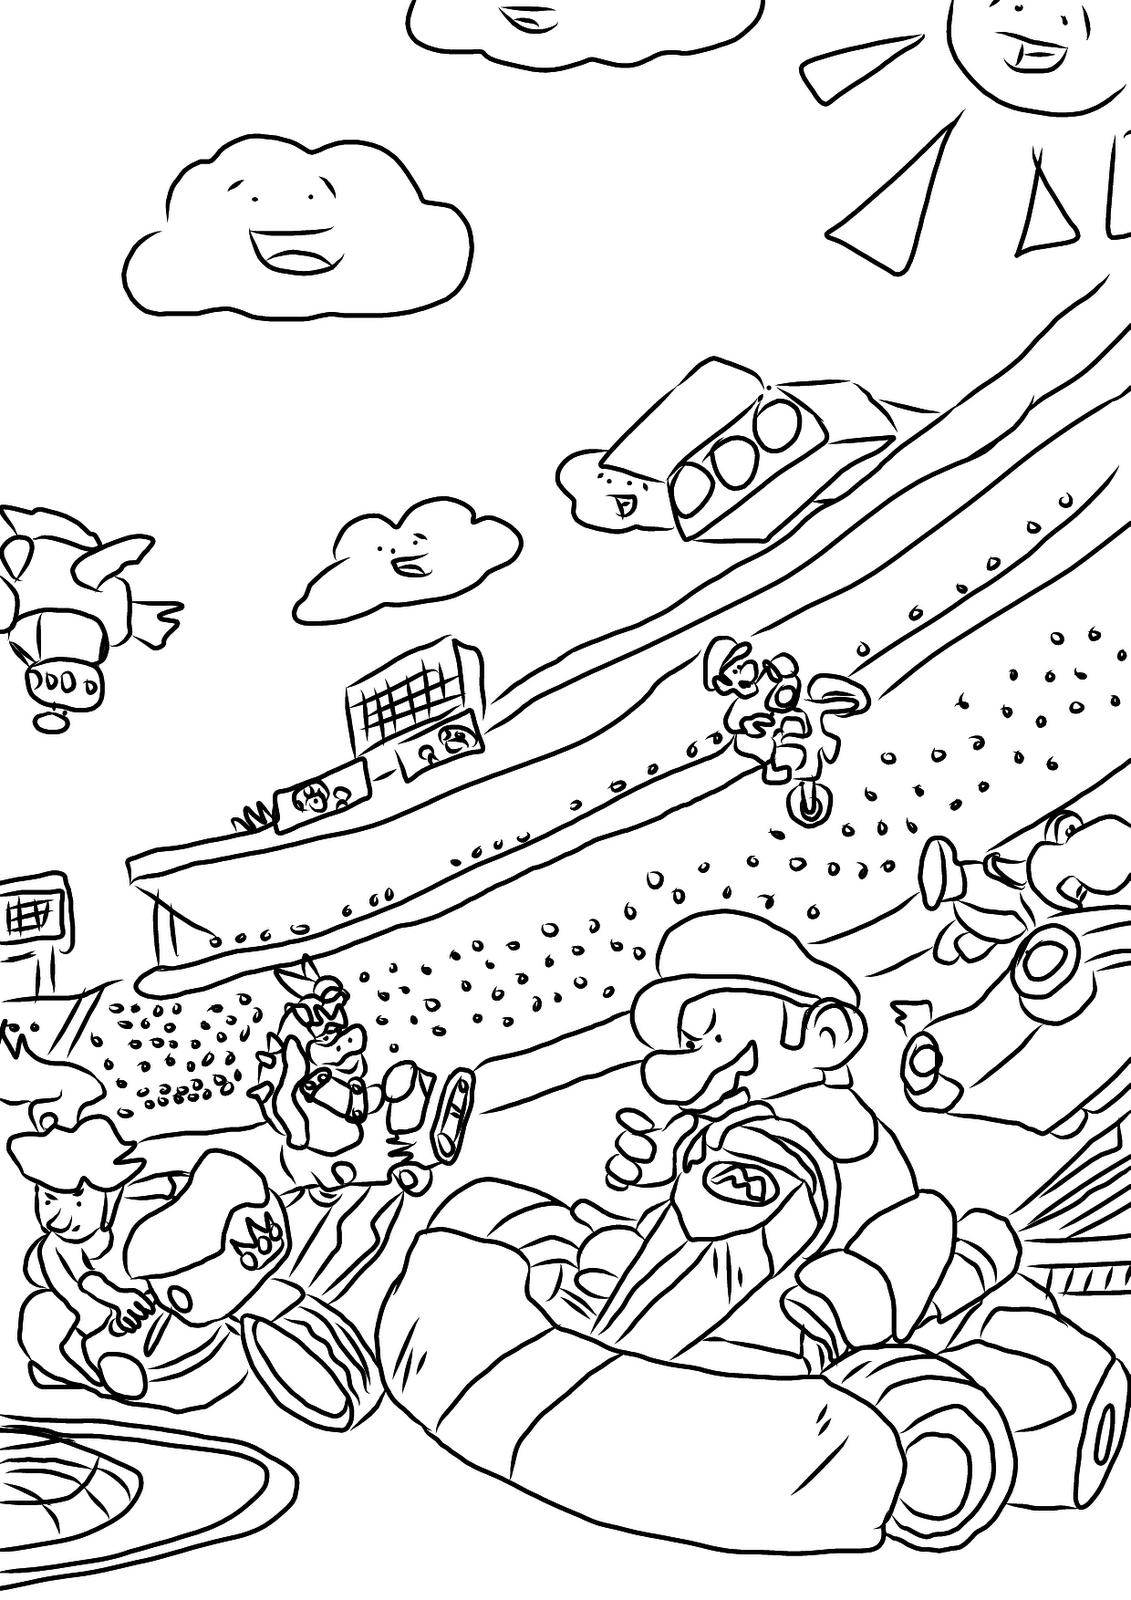 Mario Kart 8 Drawing At GetDrawings